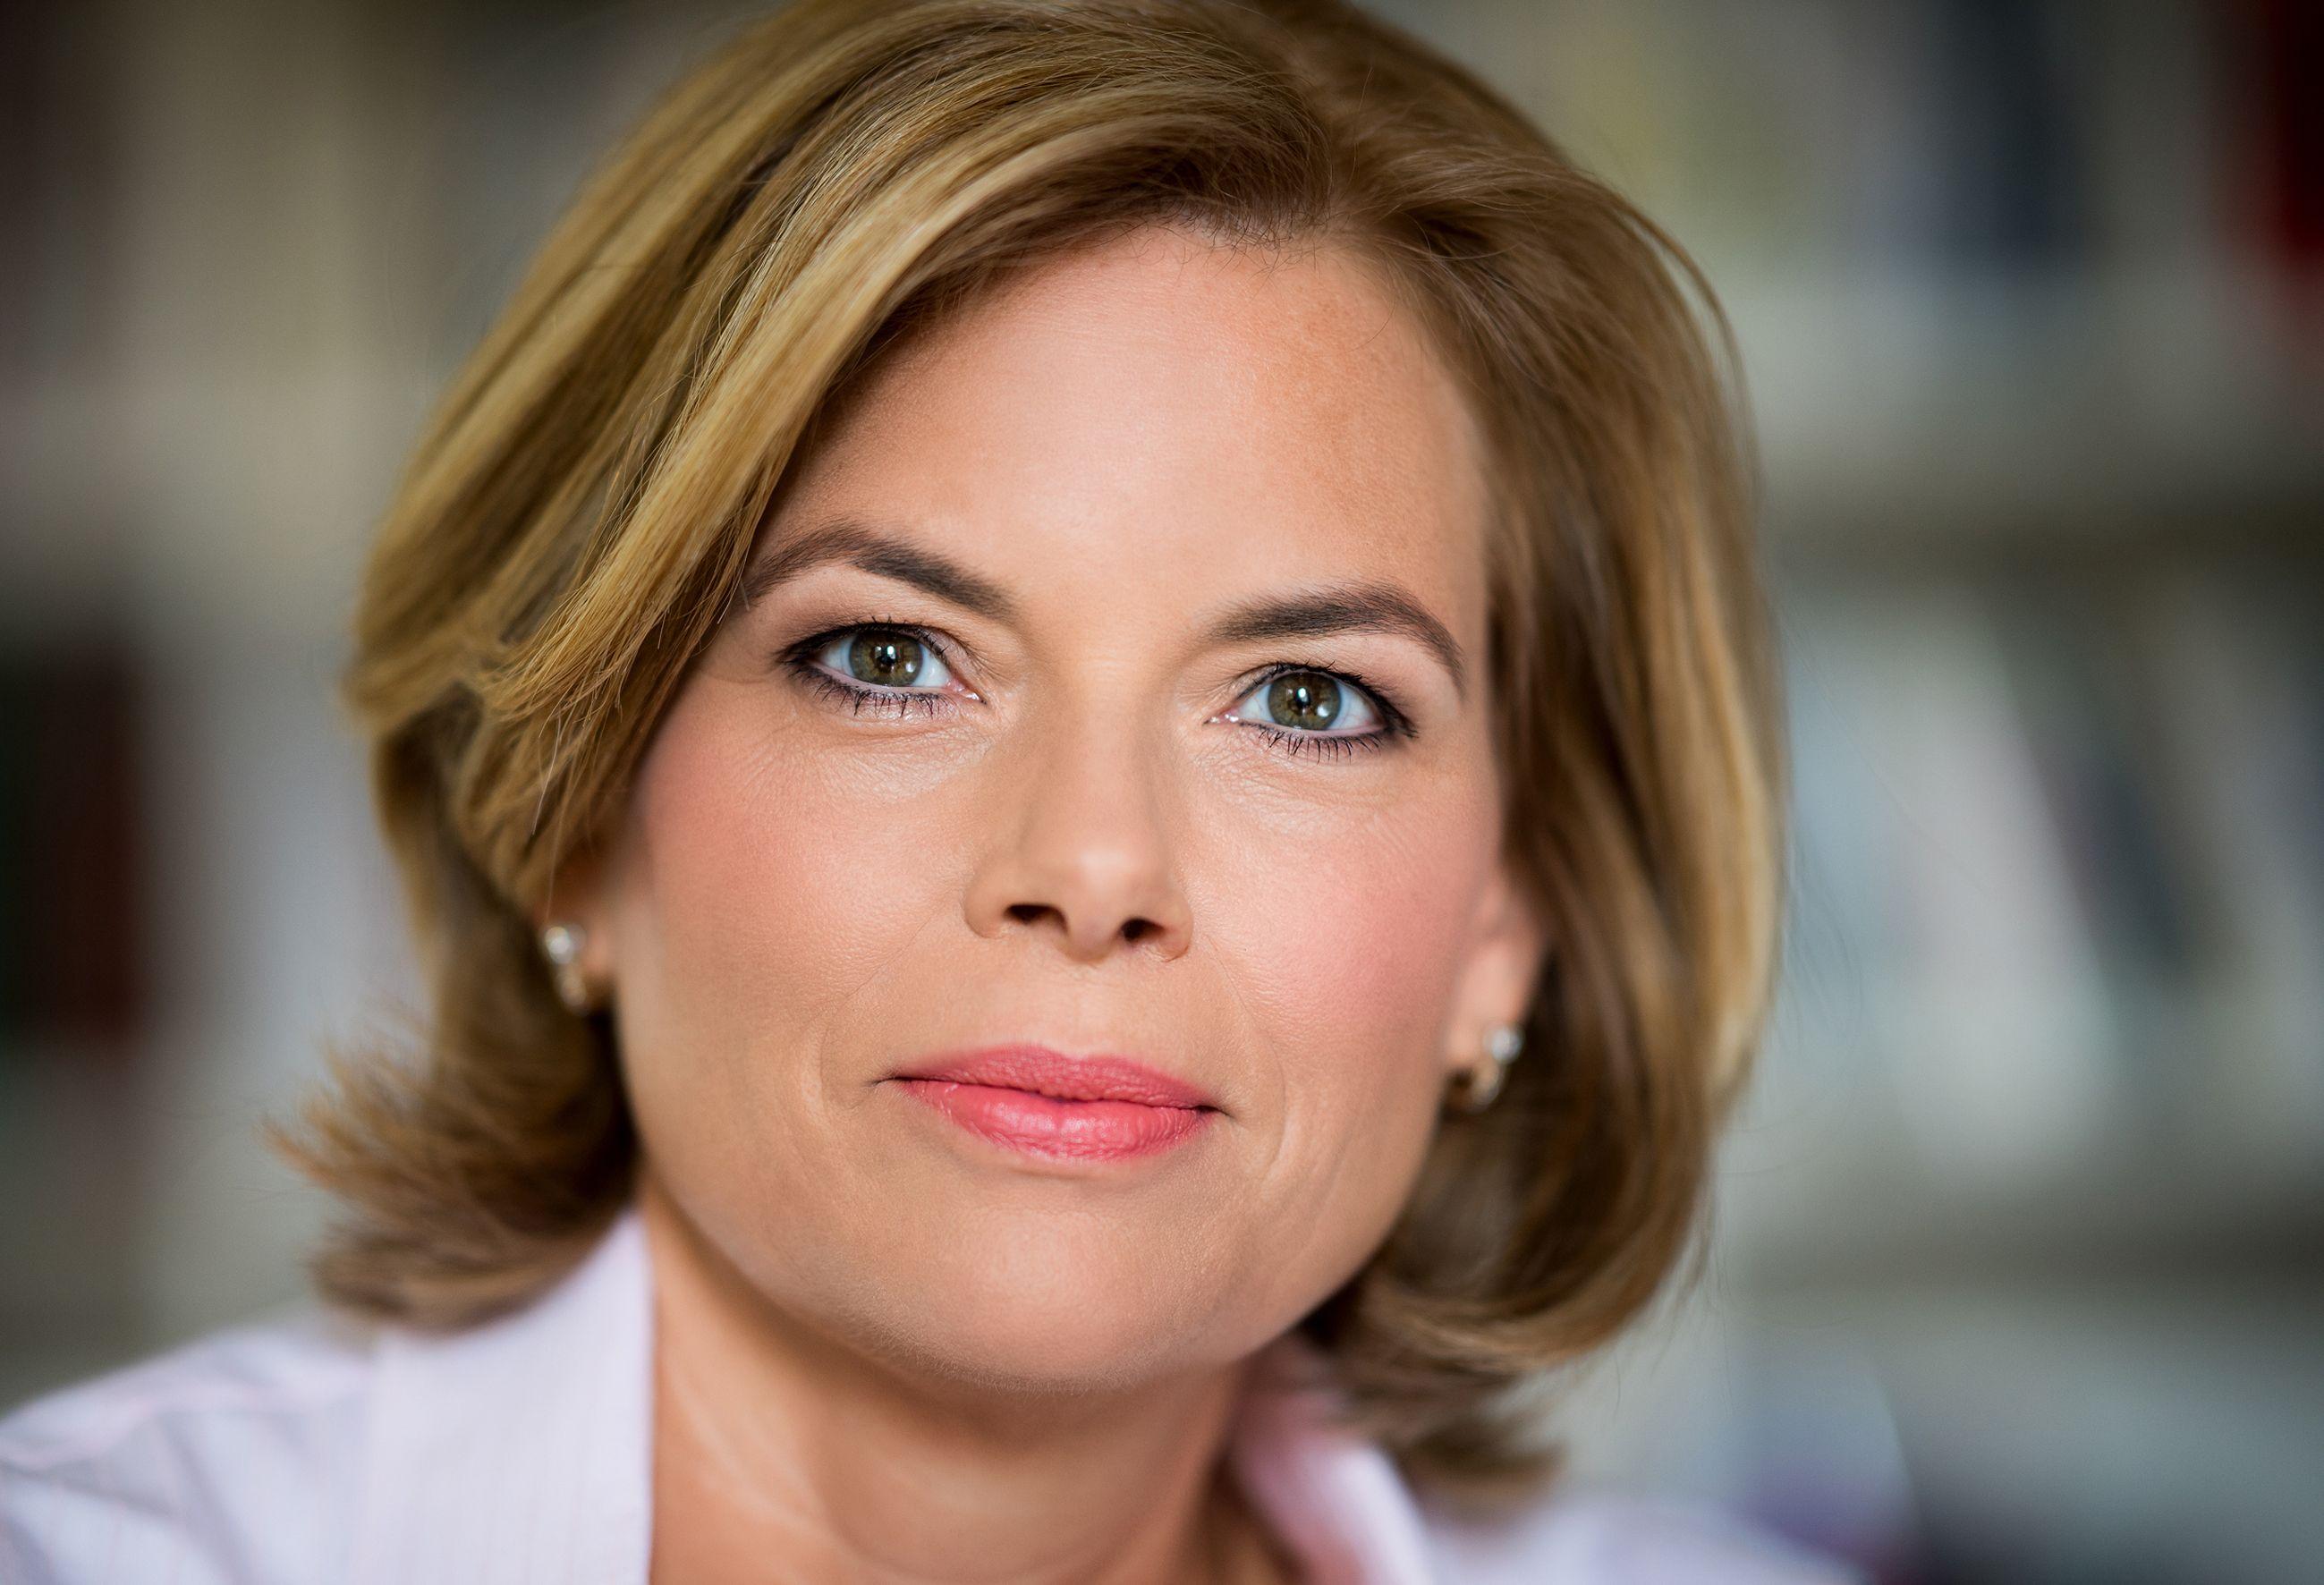 Pressebild Julia Kloeckner 2017 6 Jpg Julia Klockner Maria Furtwangler Kurze Haare